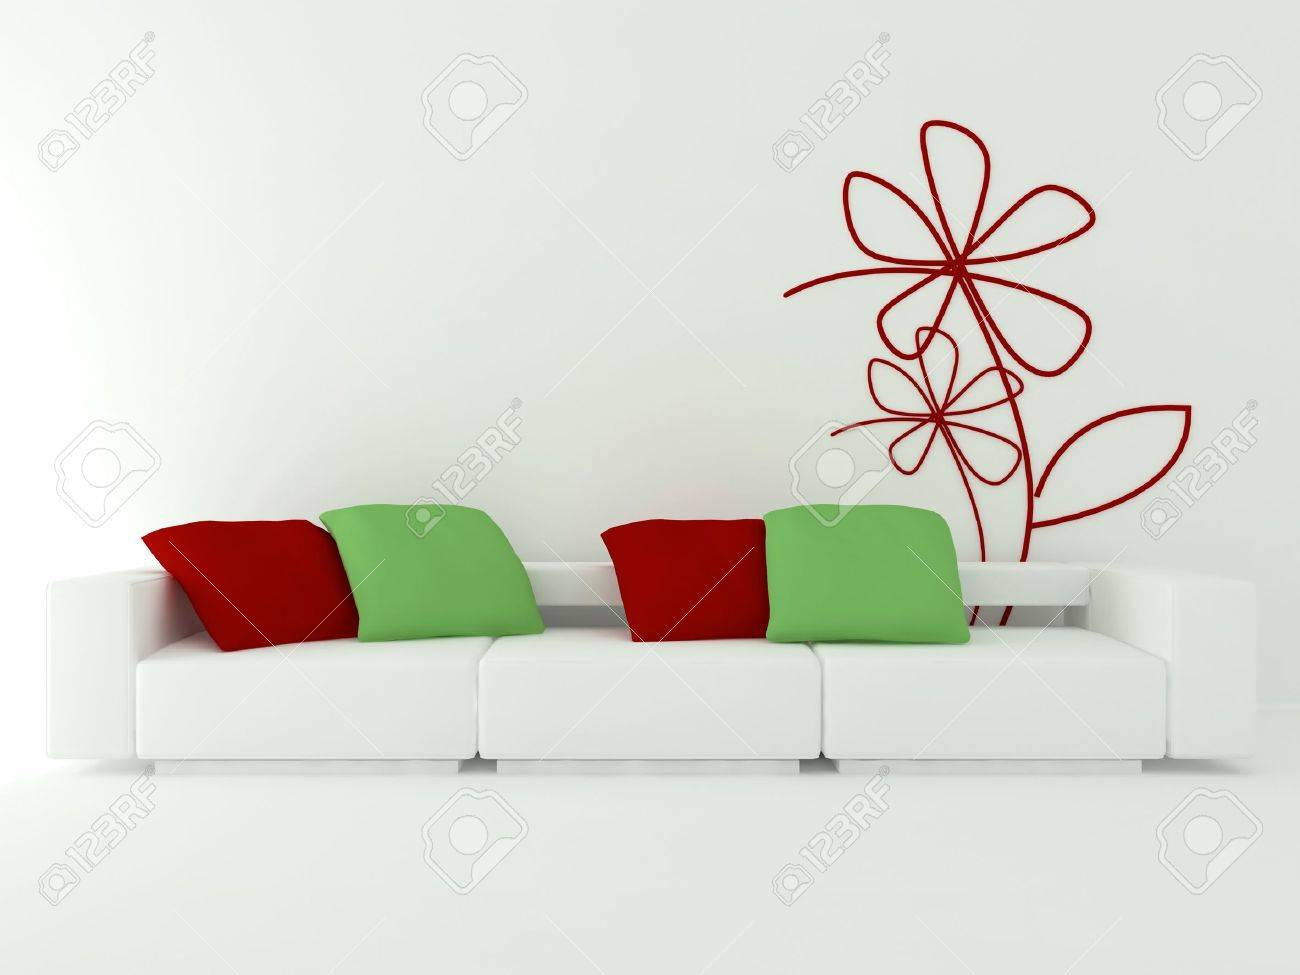 Interior Design Of Modern White Living Room With Big White Sofa ...